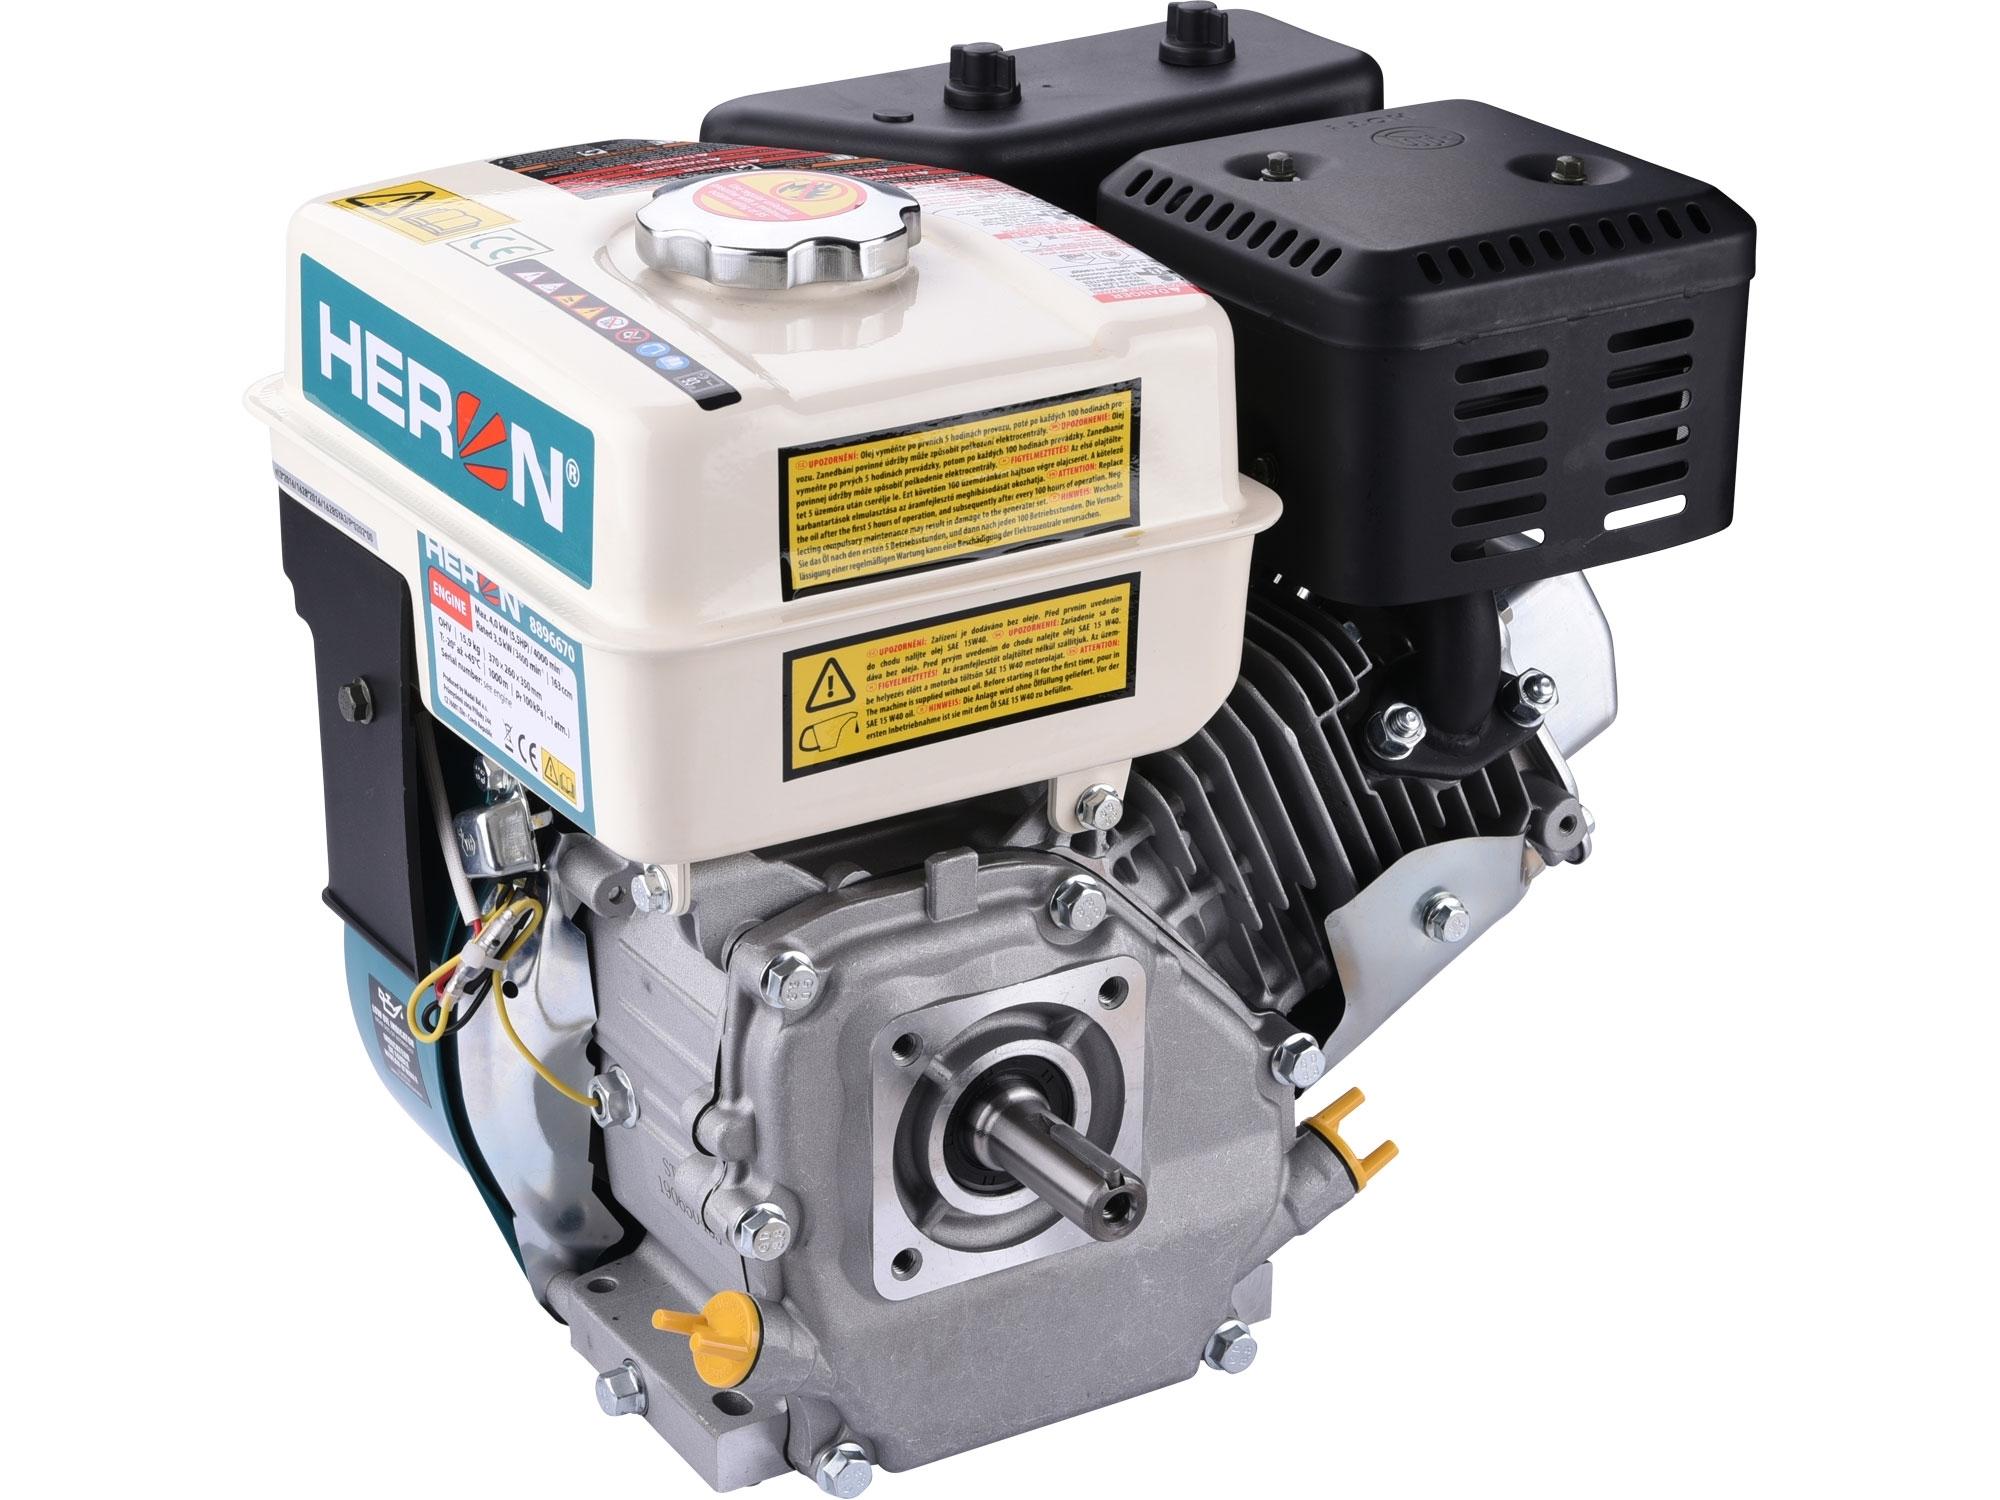 motor samostatný, 163ccm, 5,5HP, HERON 8896670